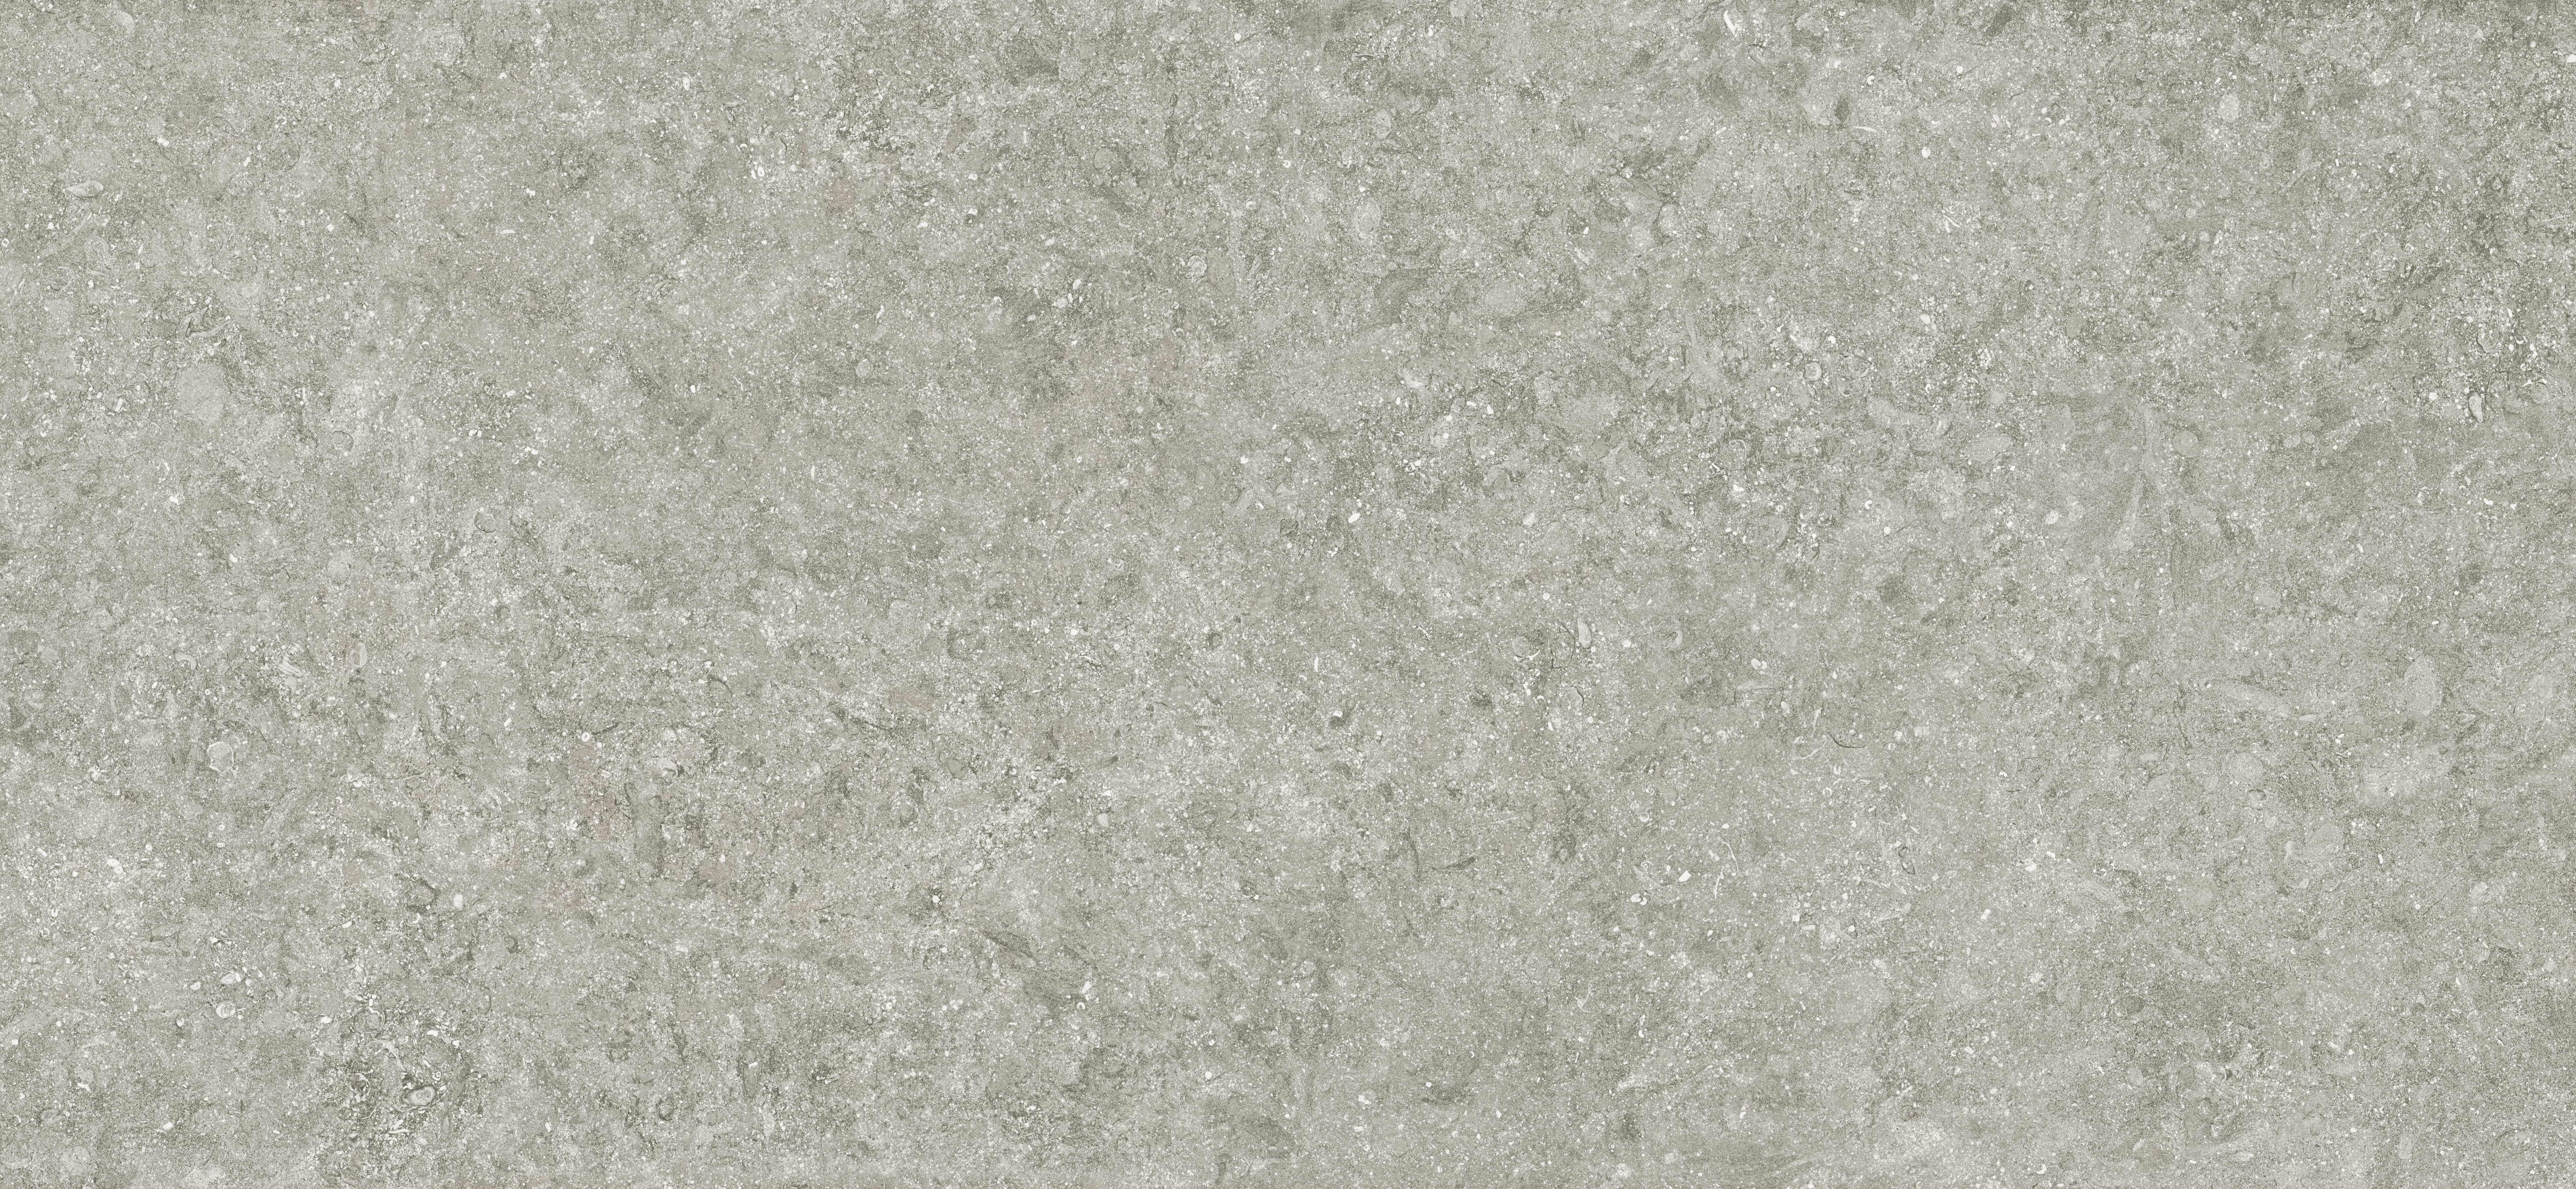 78bs 37 bluestone gris 120×260 rgb